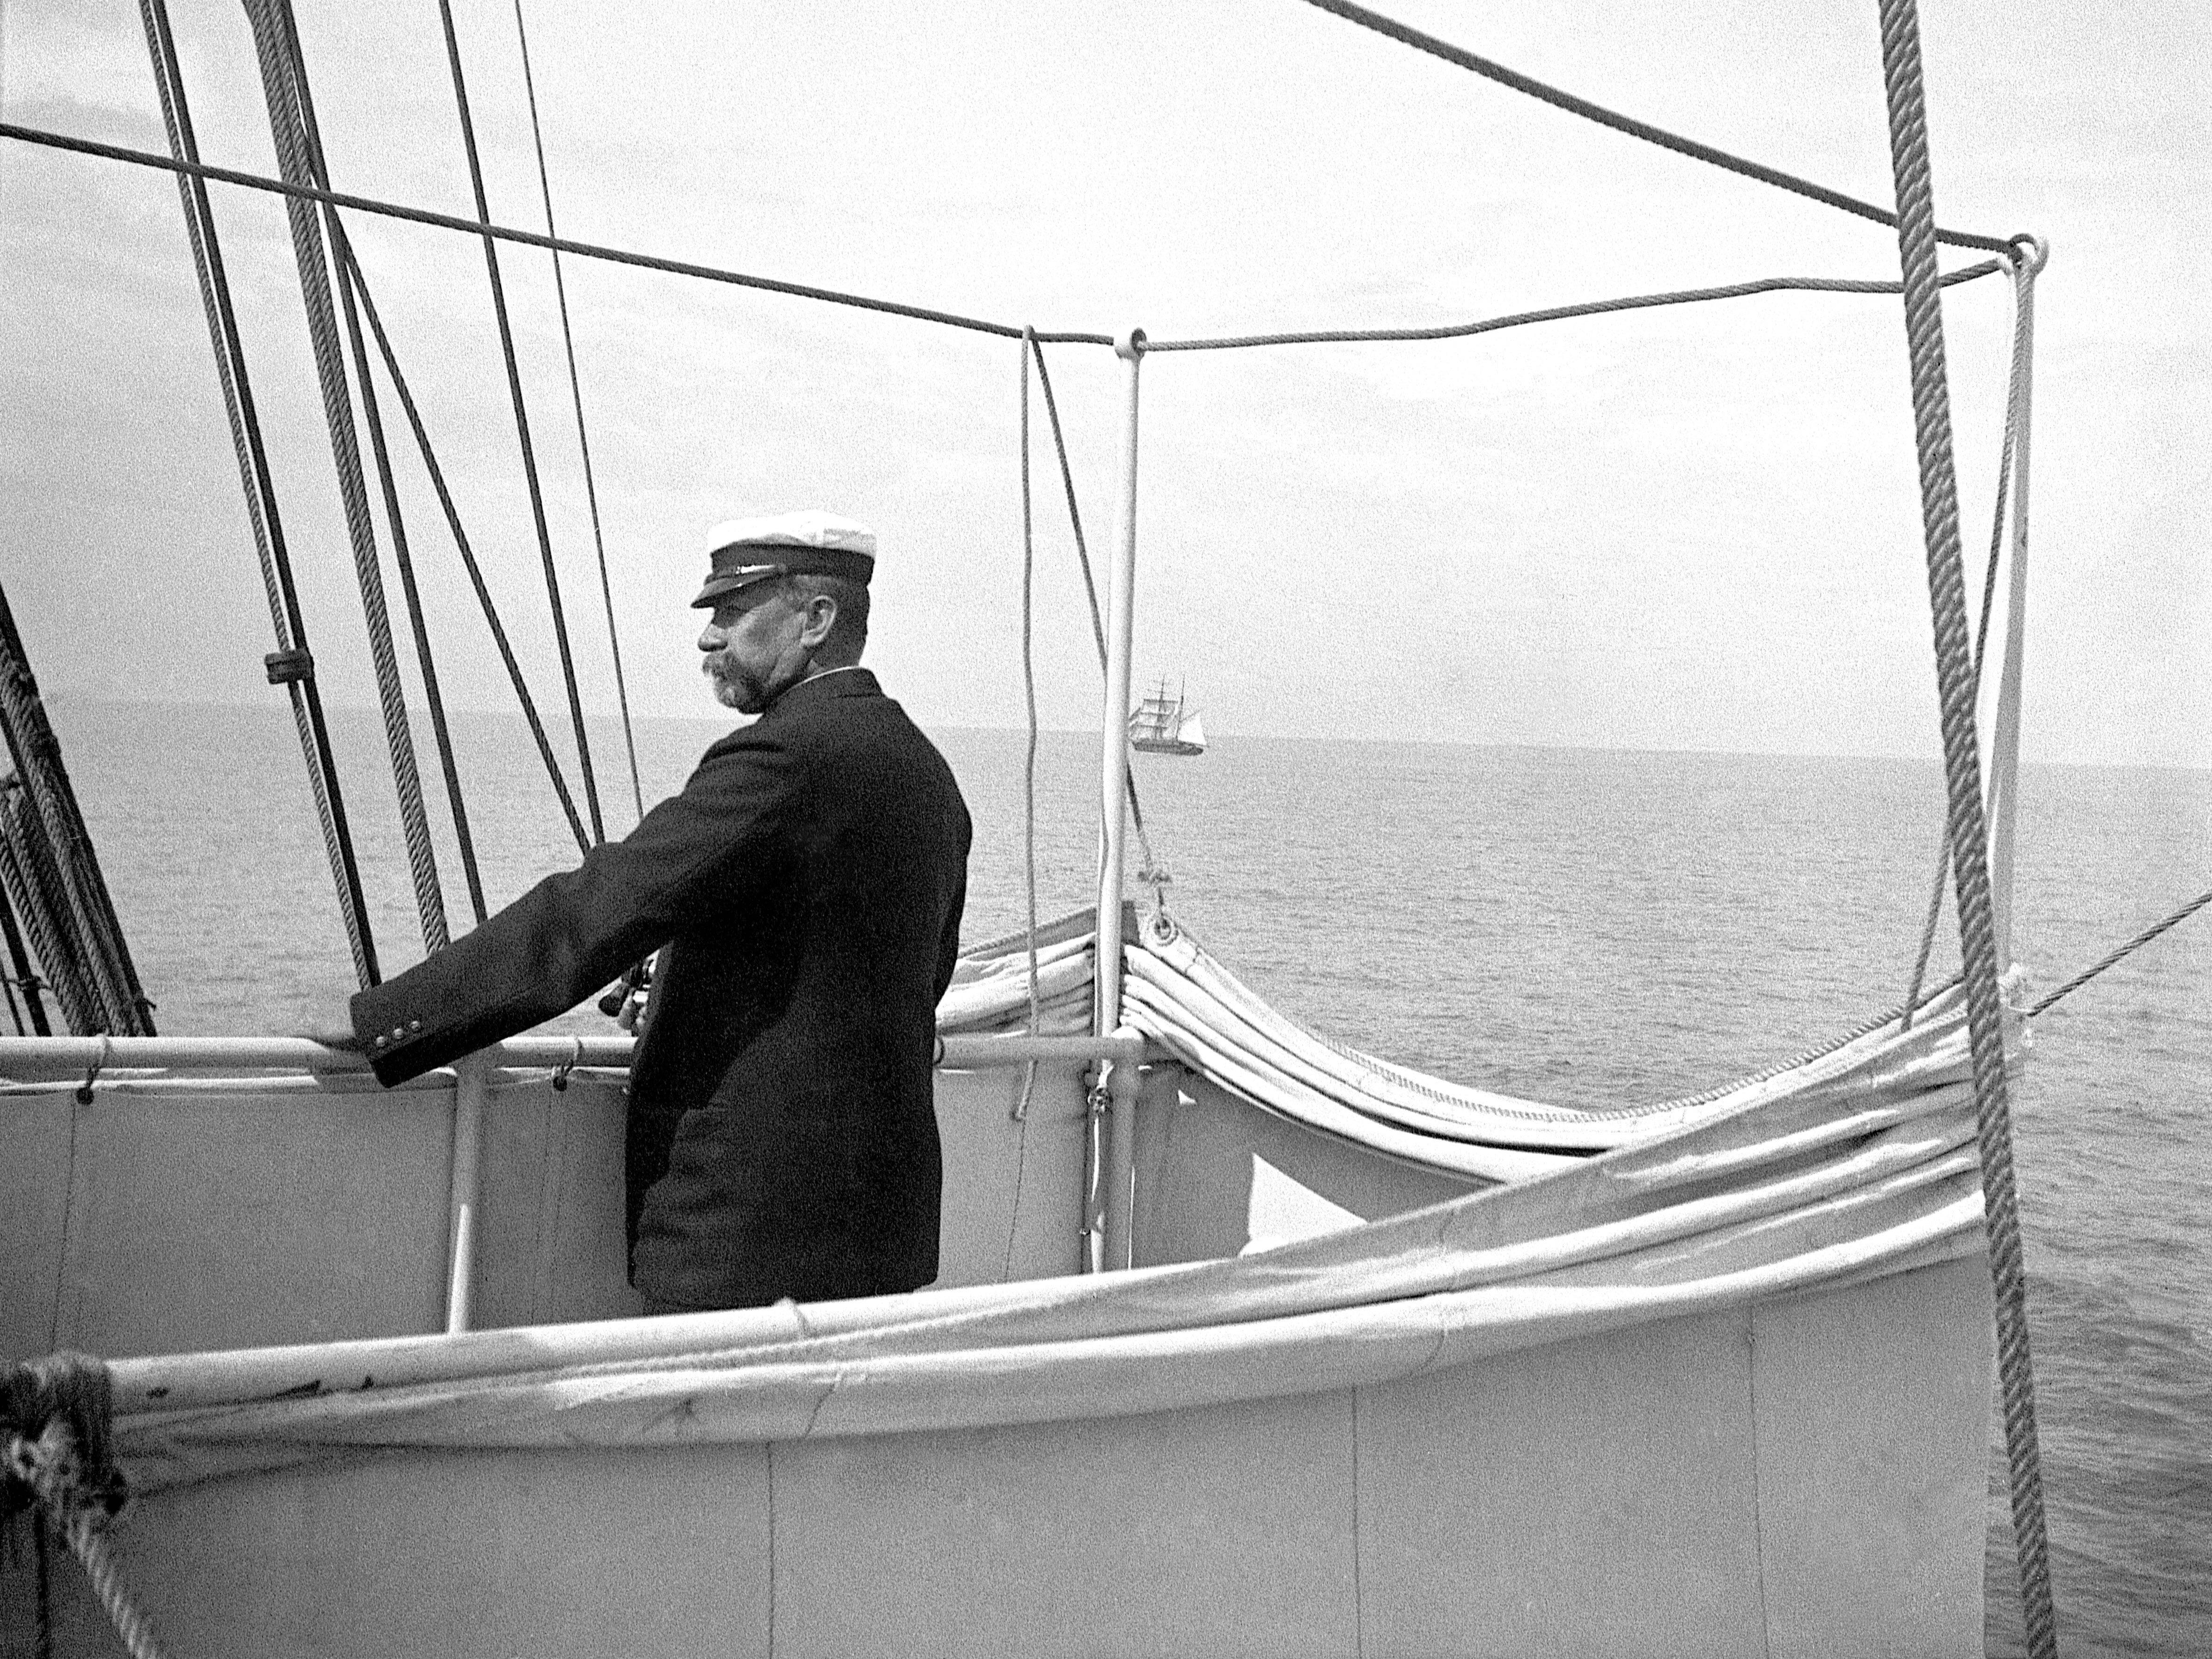 Albert Ier sur passerelle - Institut Océanographique de Monaco